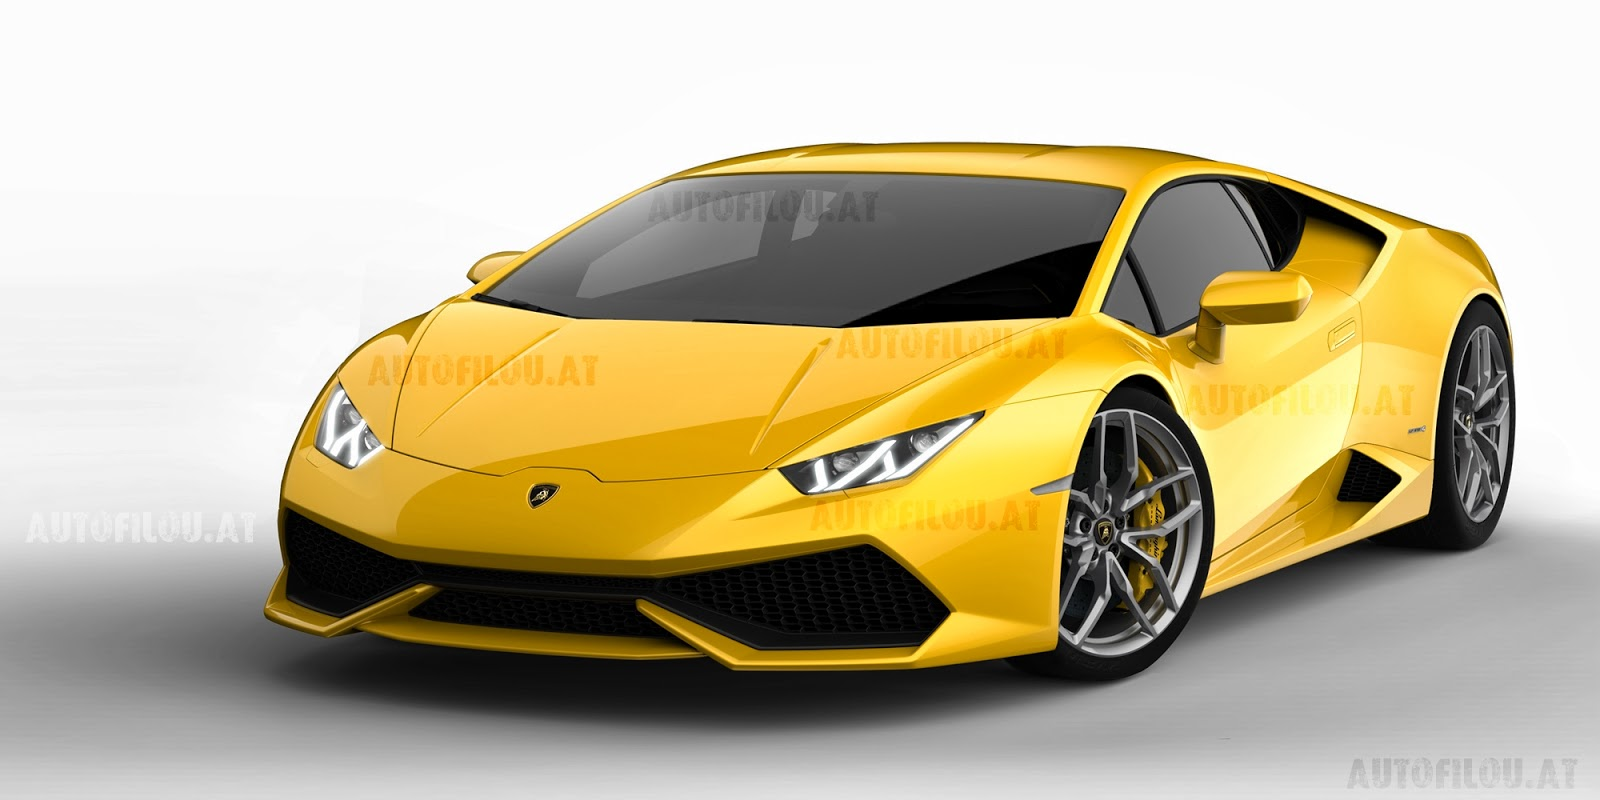 Specifications And Cars Lamborghini Huracan November 2015 Otomotif